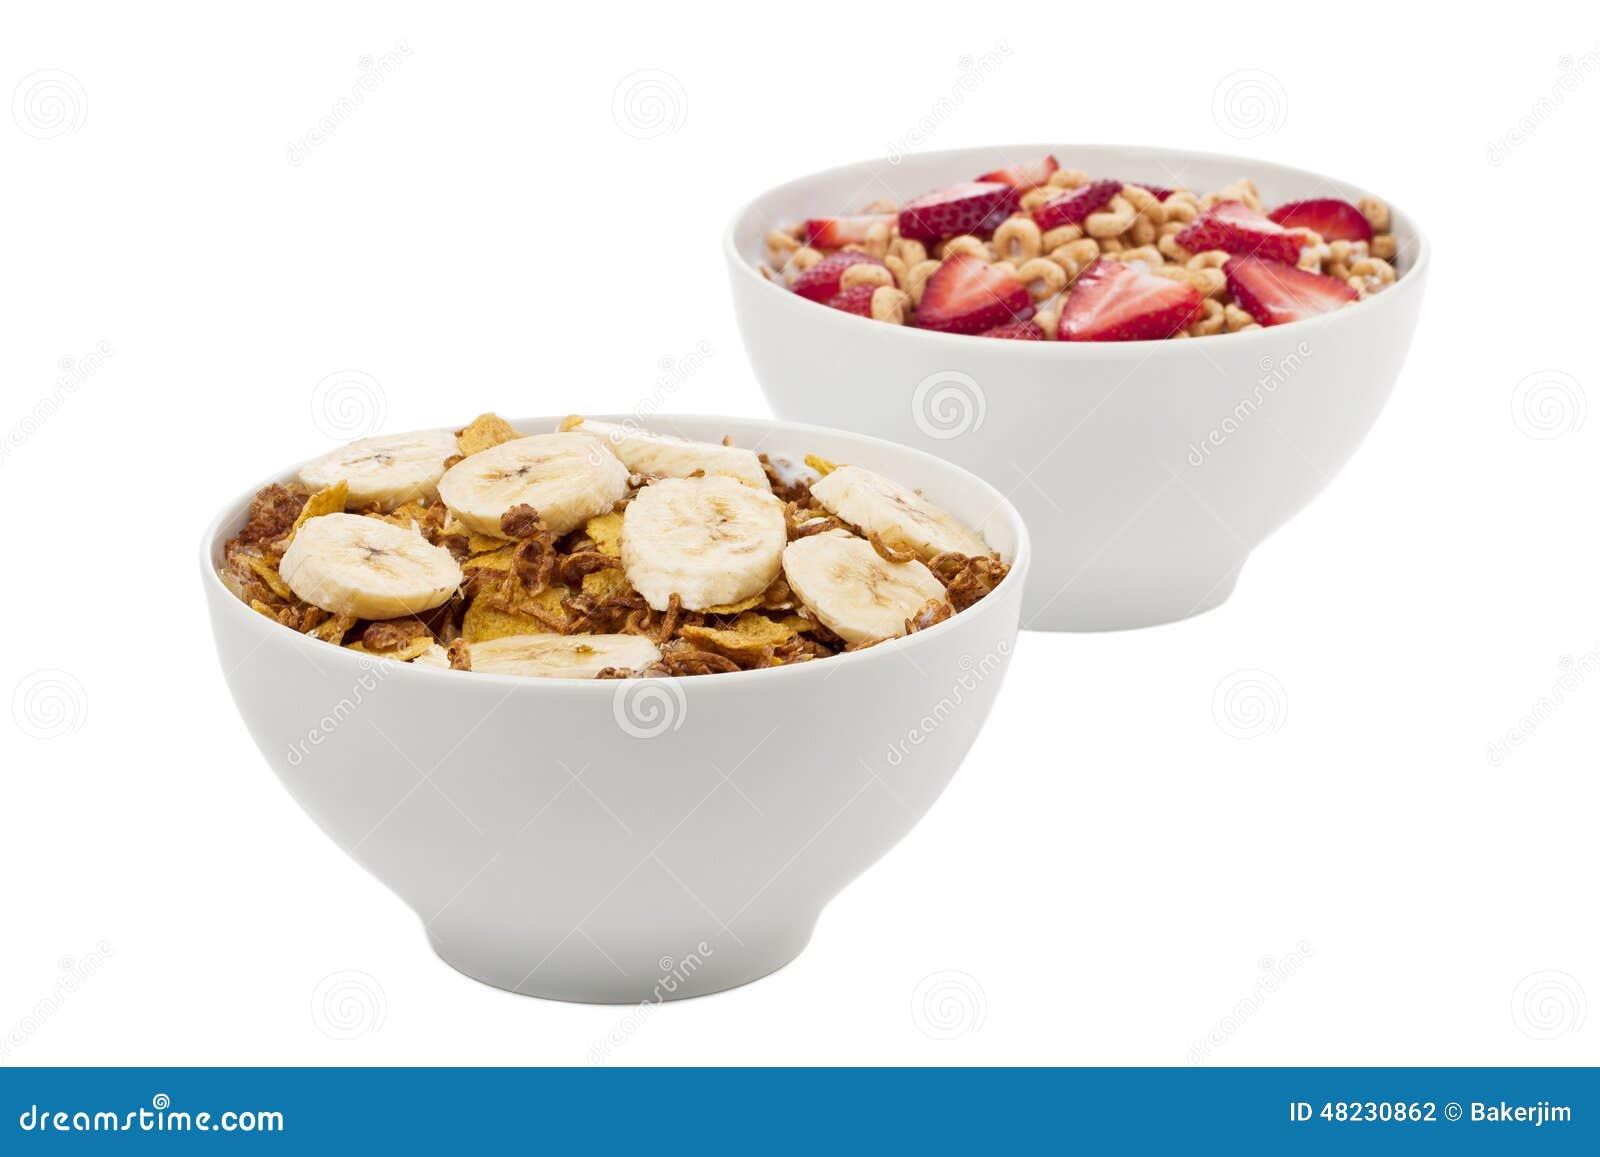 Two fruity breakfast cereal